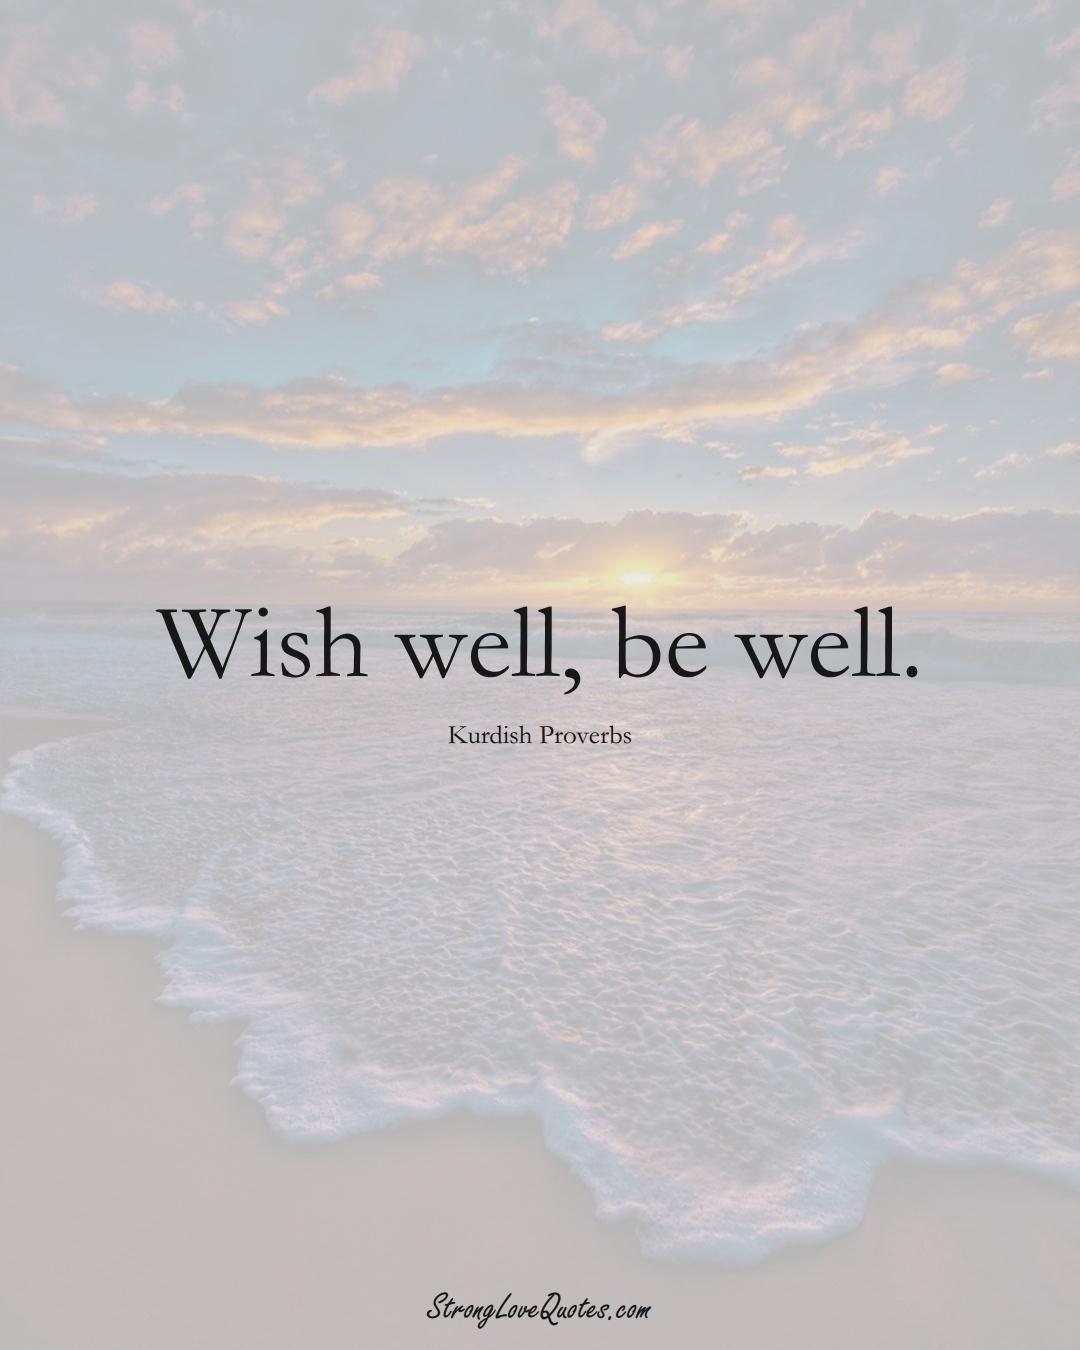 Wish well, be well. (Kurdish Sayings);  #aVarietyofCulturesSayings